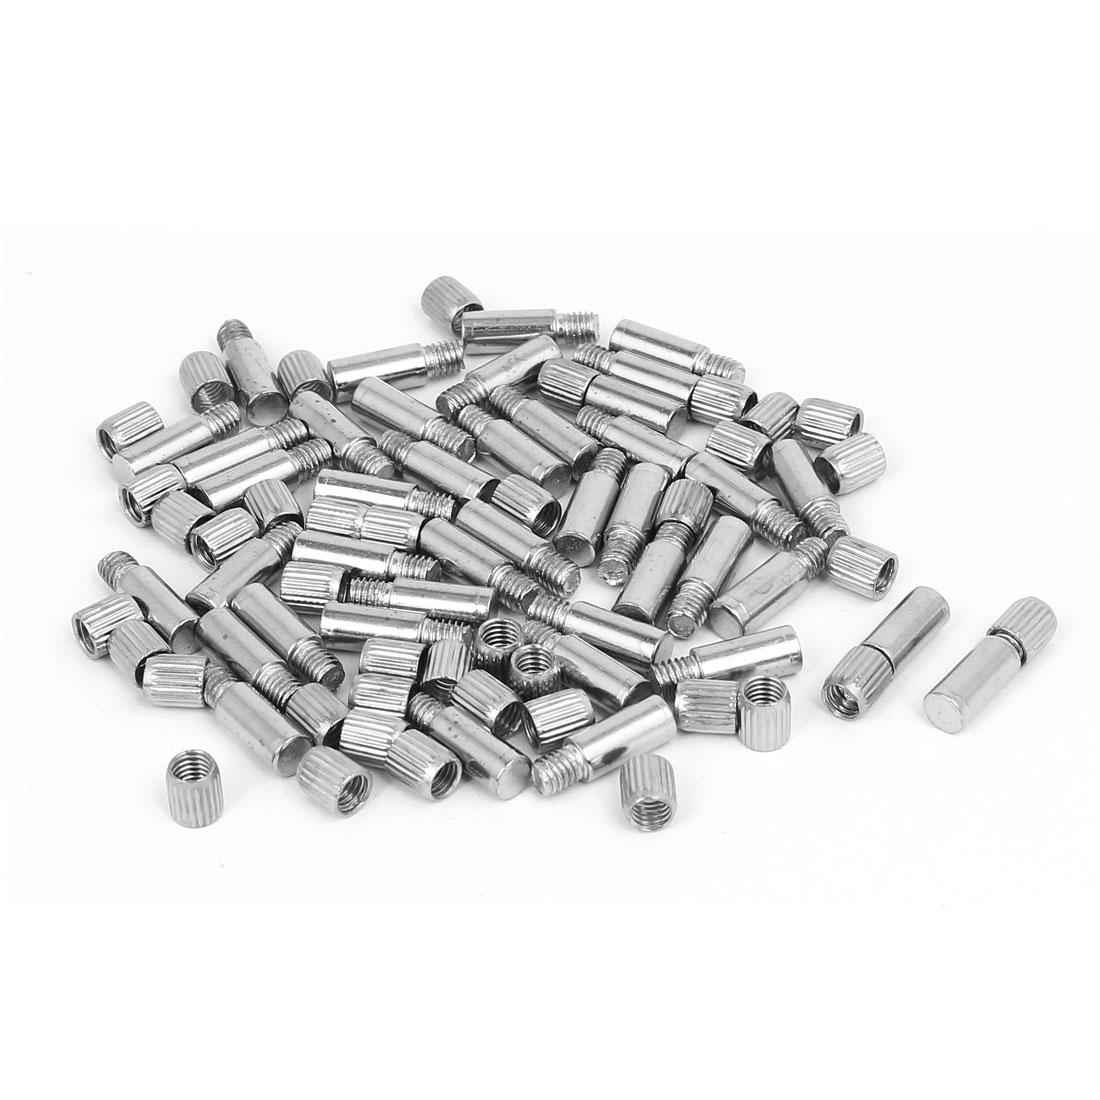 6mm Diameter Metal Shelf Support Pin Supporter Holder Bracket Silver Tone 40pcs